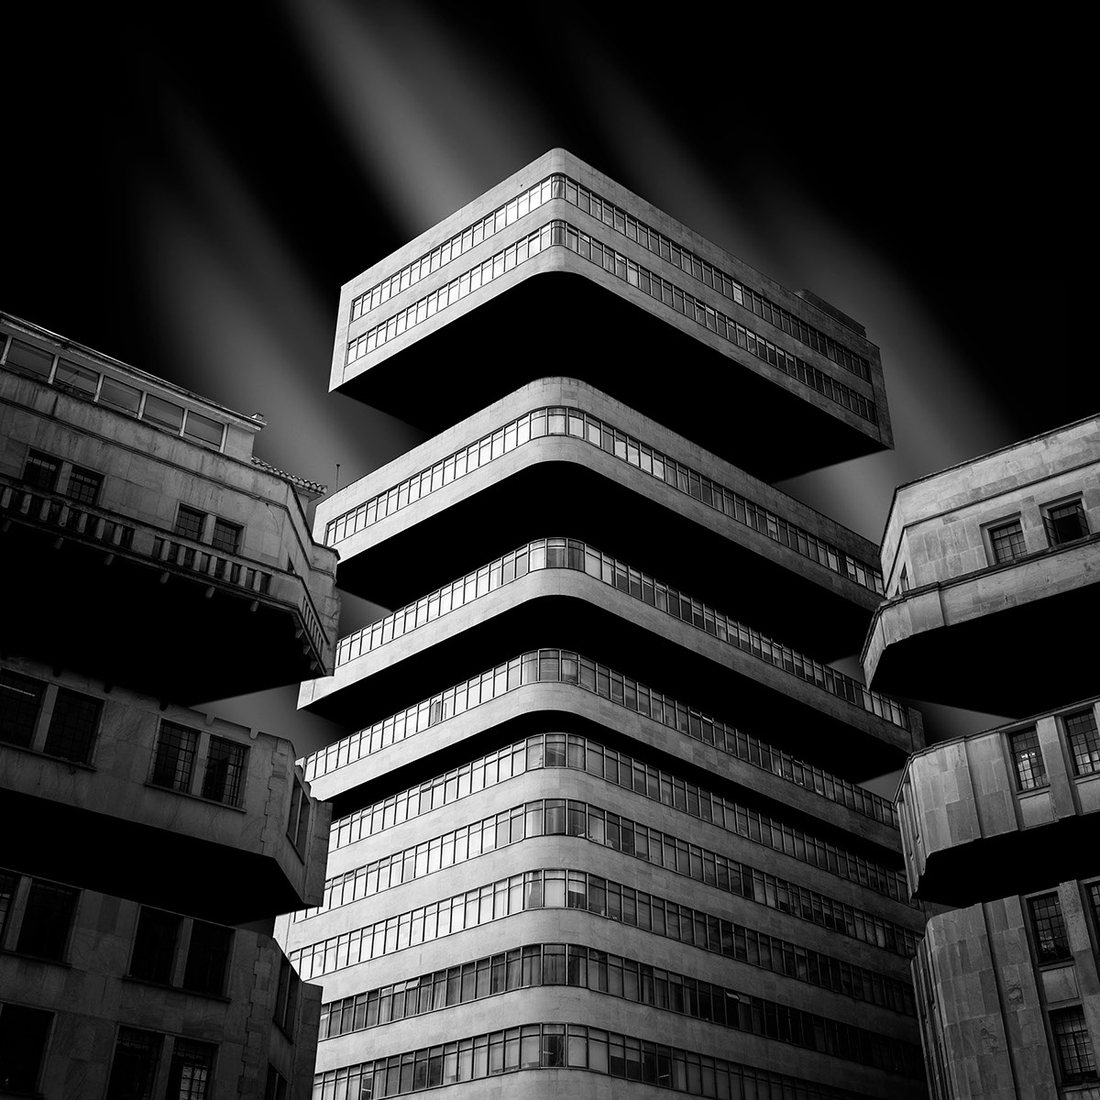 06-Daniel-Garay-Arango-Black-and-White-Surreal-Photographs-Architectural-Deconstruction-www-designstack-co